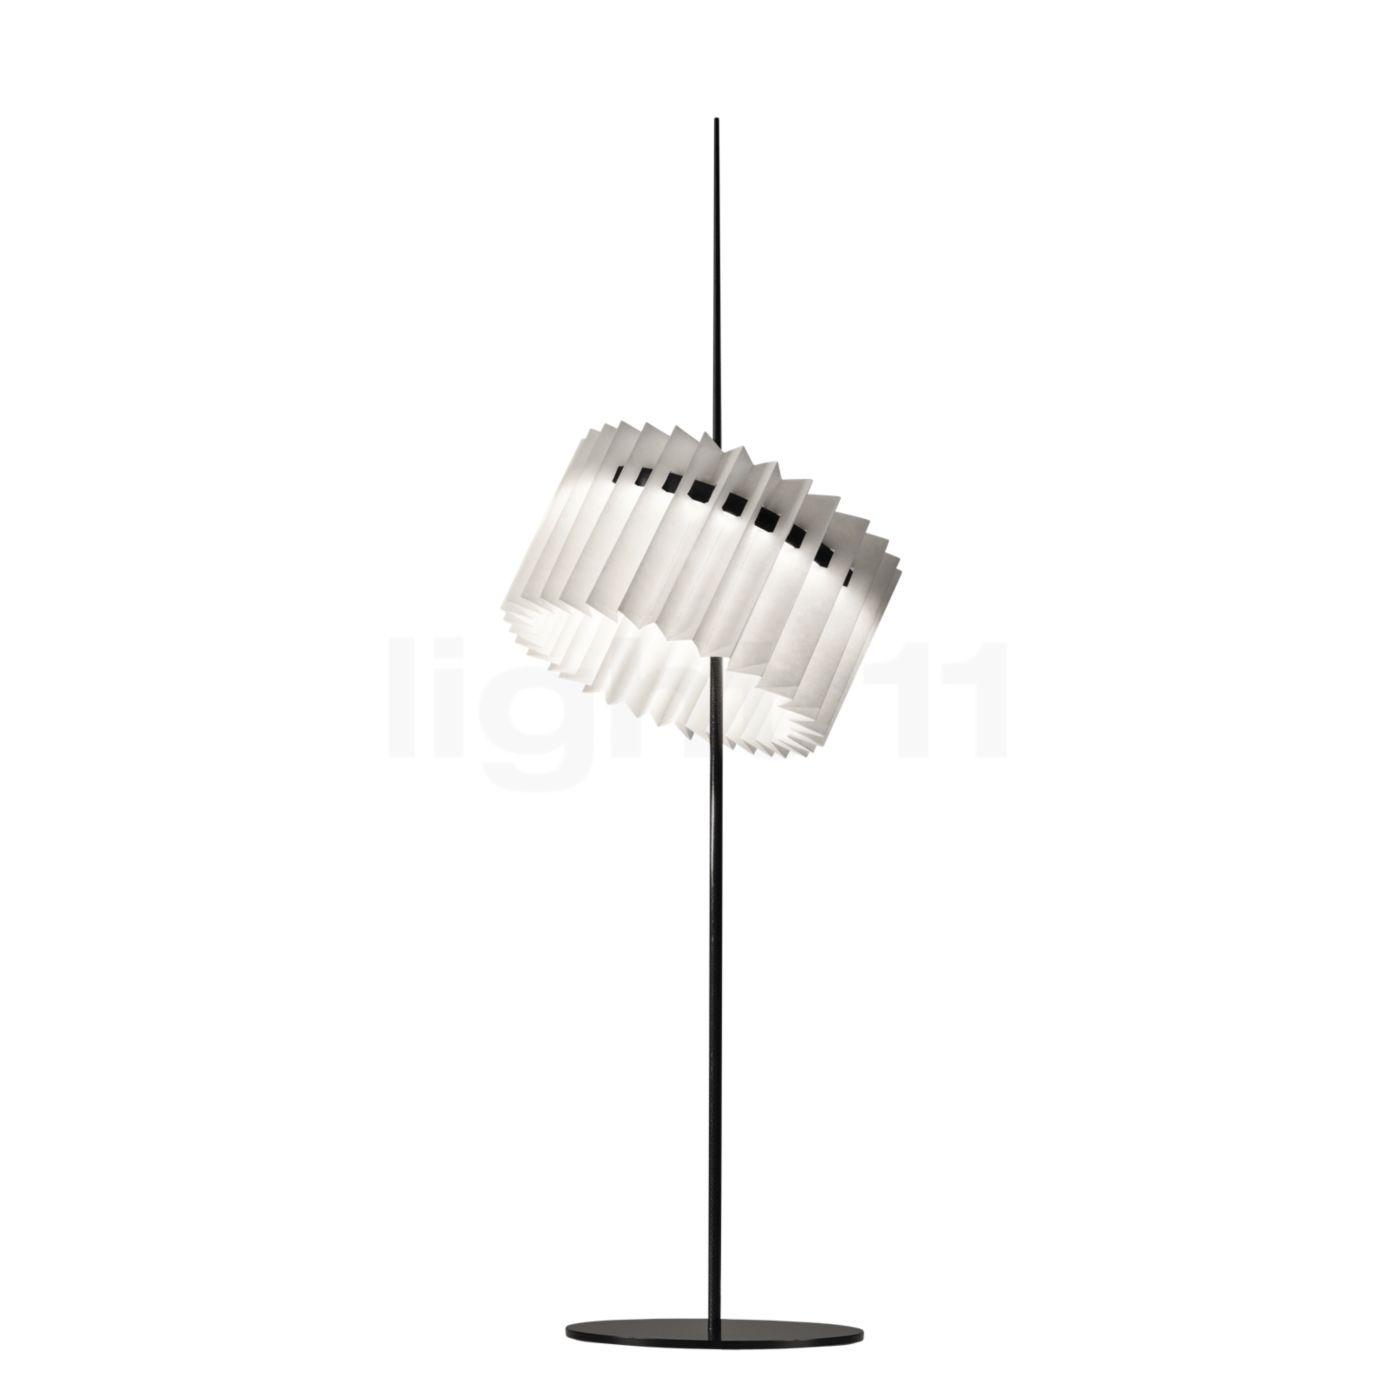 Ingo Maurer Ringelpiez Lampada da tavolo LED - light11.it